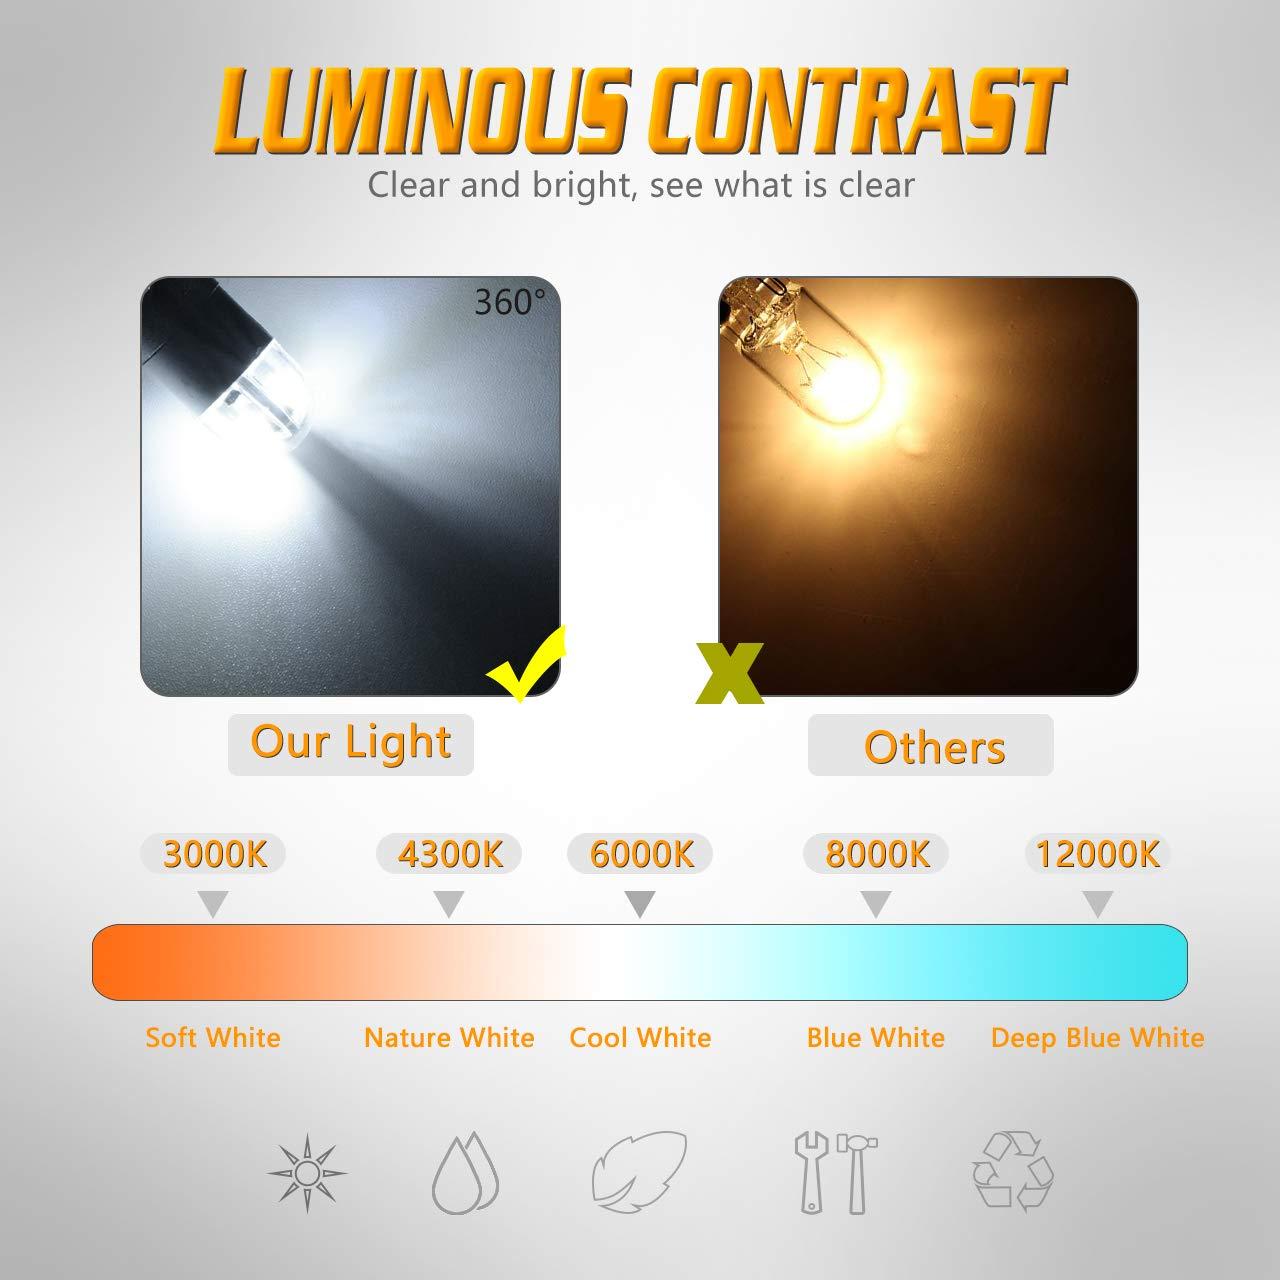 Tuincyn luce di retromarcia luce di ricambio a cupola per targa Lampadina bianca a LED per interni auto T10/W5W 3030/2SMD confezione da 2 luci laterali di direzione 360/lumen